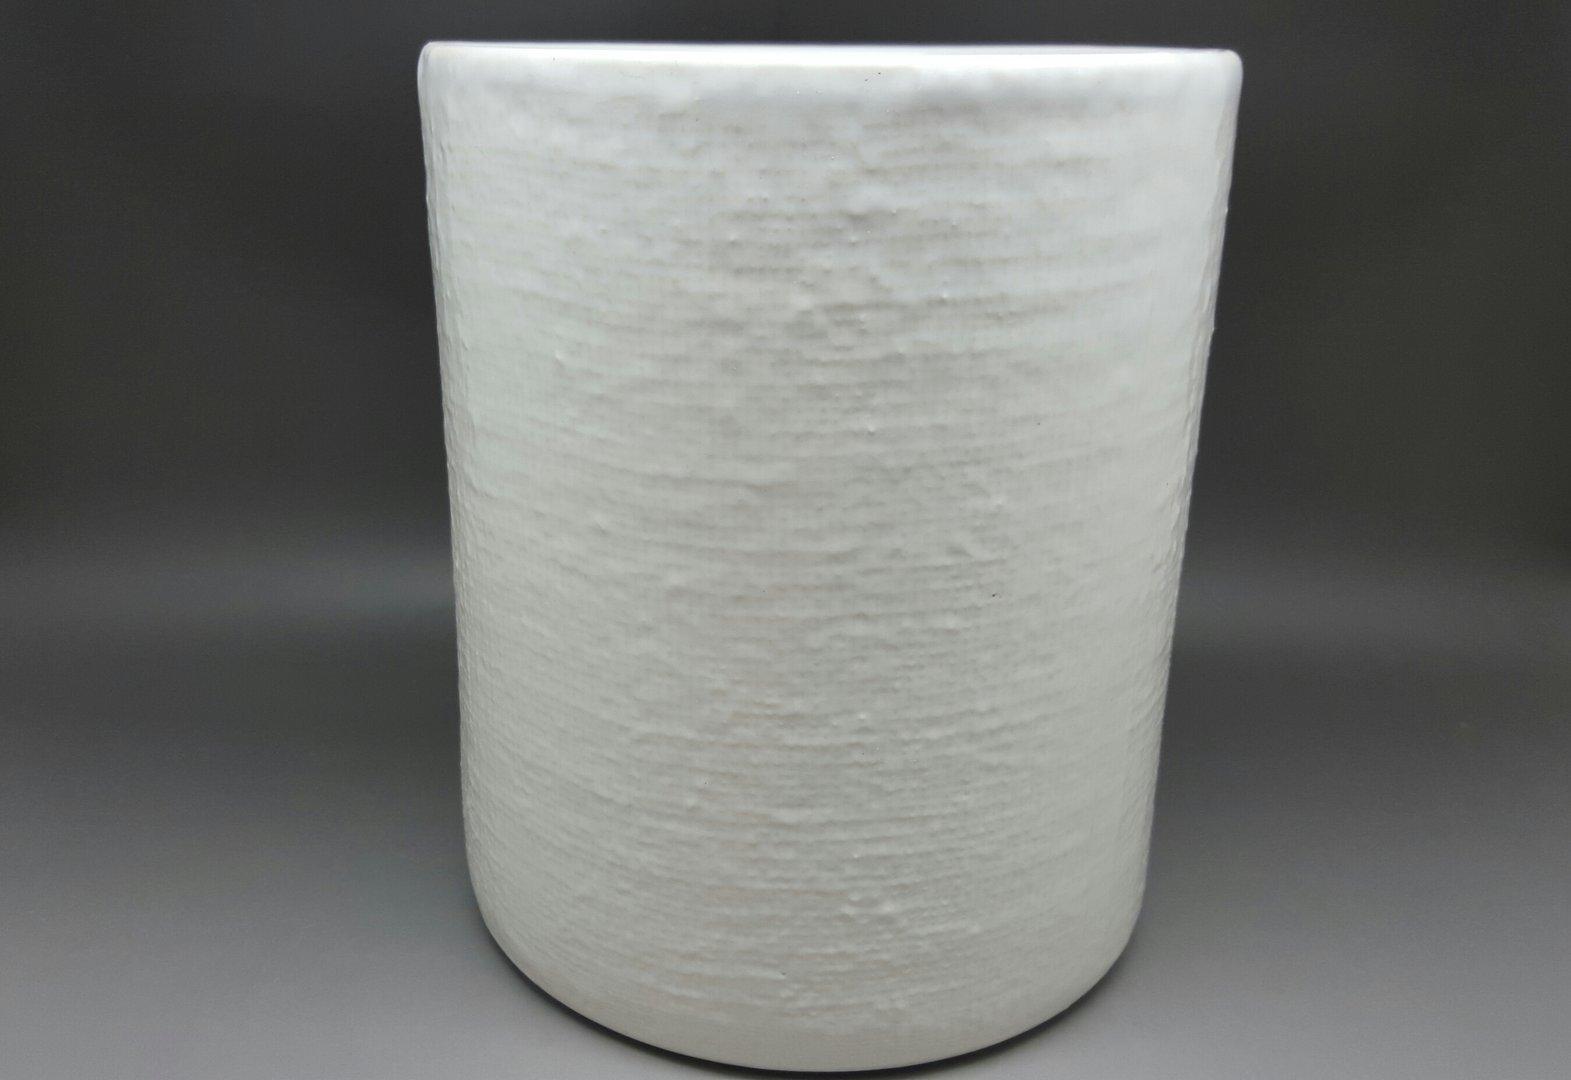 Porte ustensile provence la boutique de porcelaine for Porte ustensile